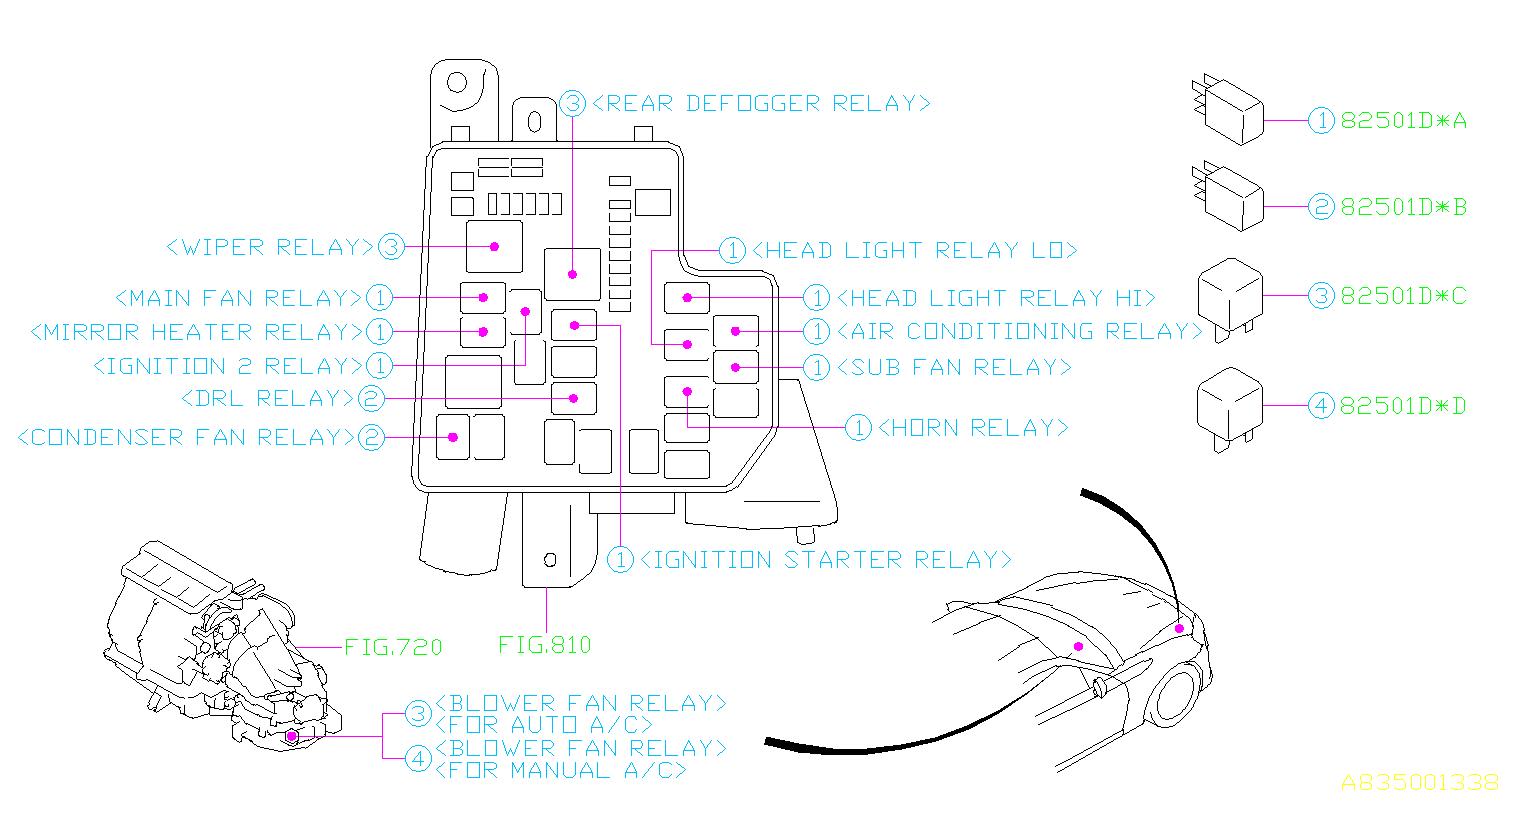 Subaru Brz Accessory Power Relay  Fuse  Box  Electrical